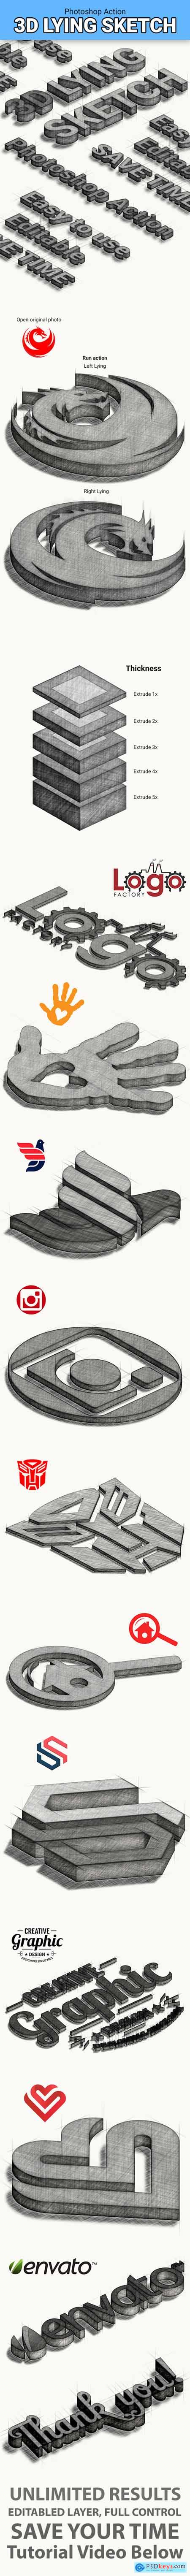 3D Lying Sketch 25287808